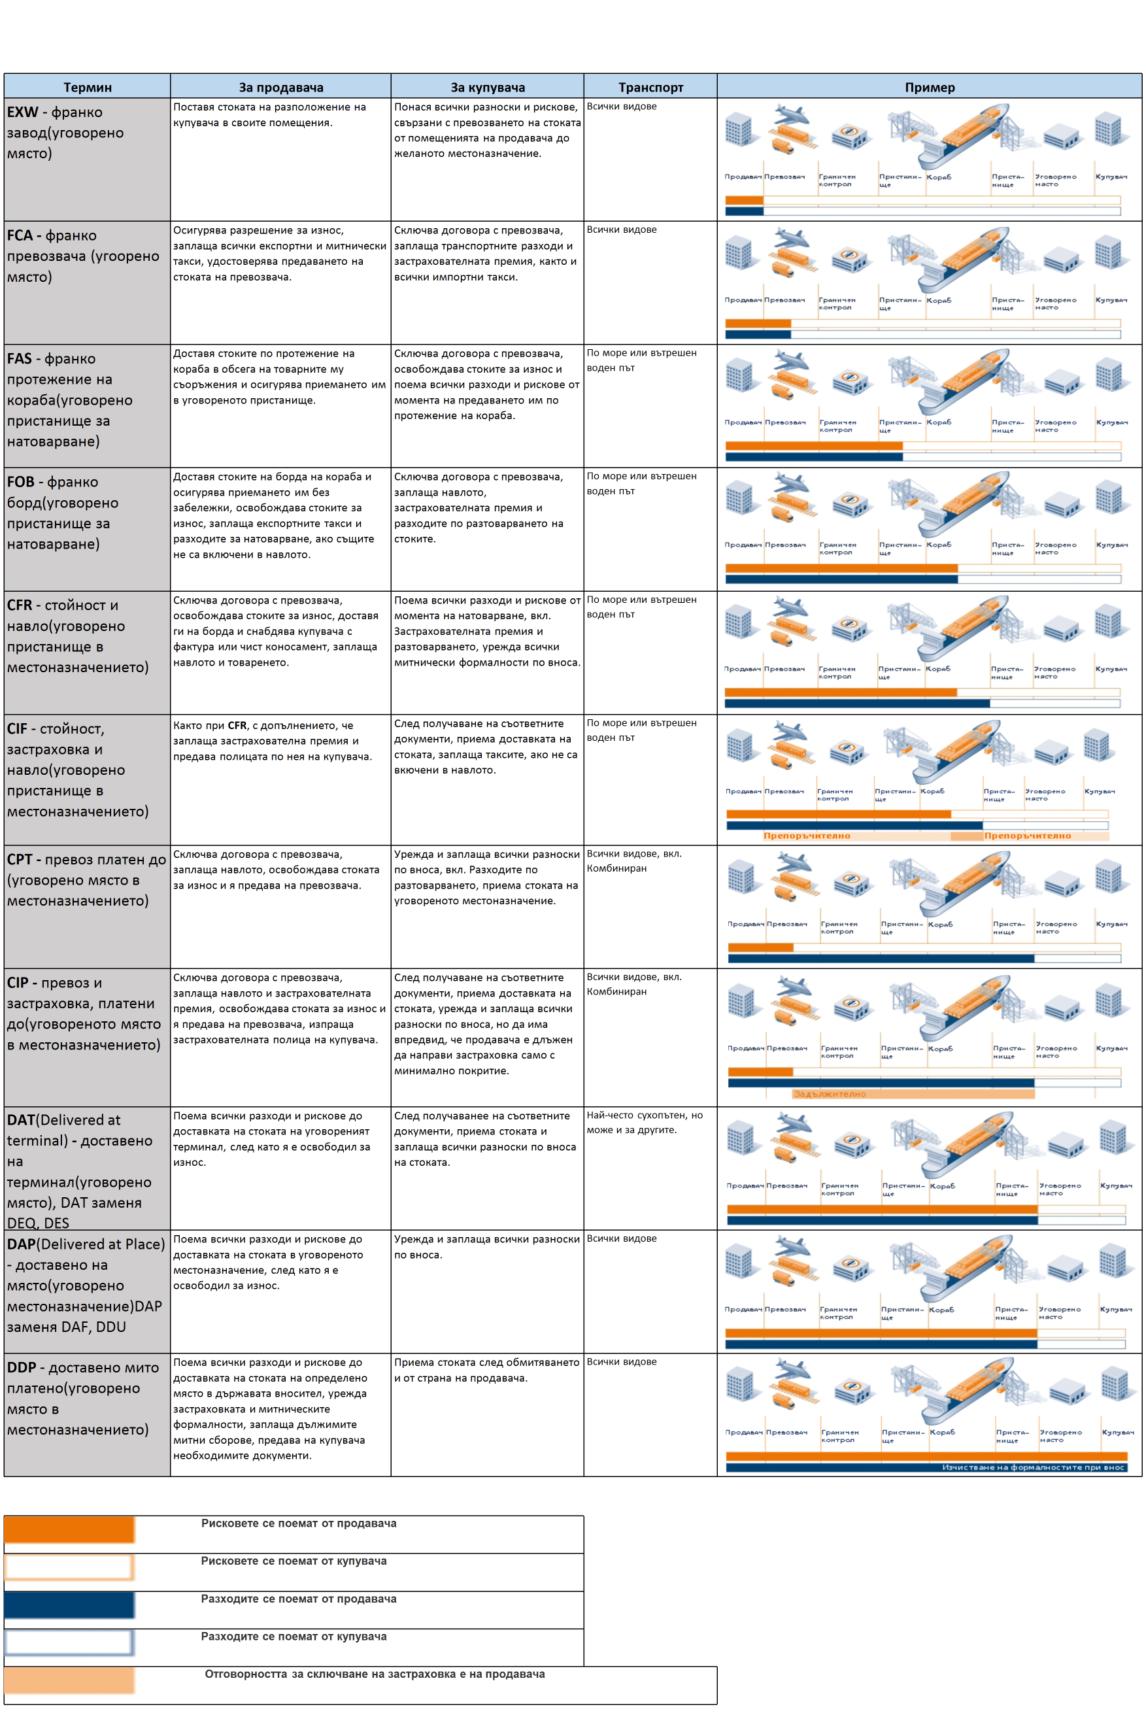 инкотермс 2020, инкотермс 2010, incoterms, условия на доставка, франкировка, DDU< DDP, CPT, CIF, CIP, DAT, FAS, FOB, EXW